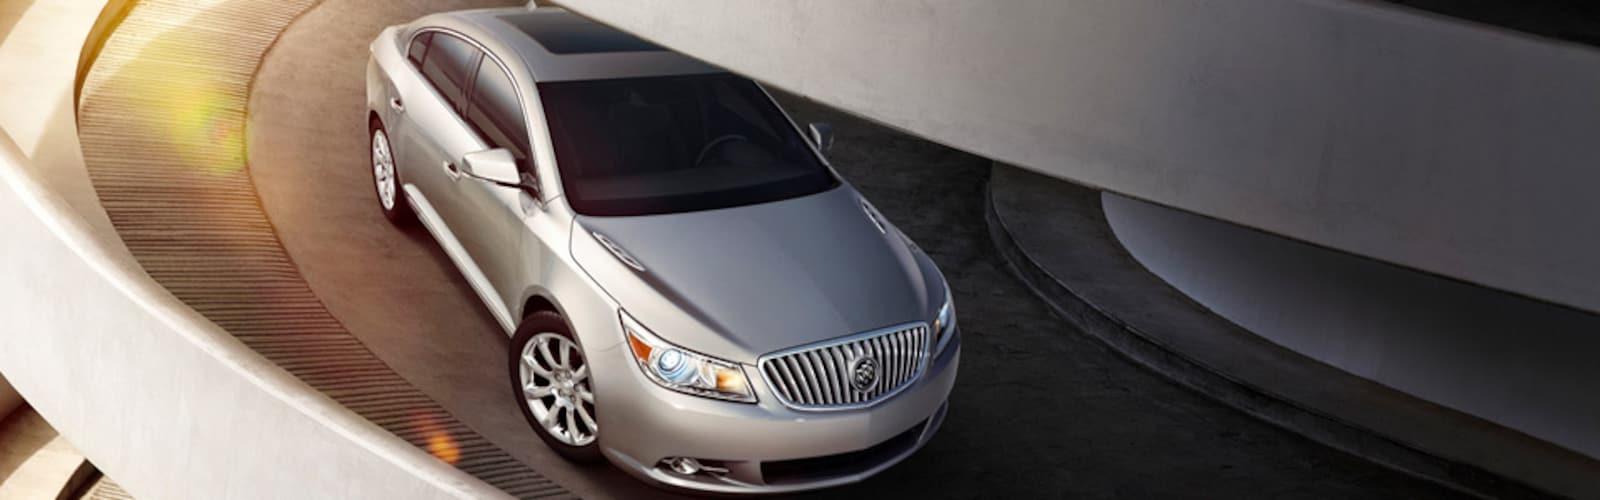 Johnson Motors | New Buick, Chevrolet, Ford, GMC Dealership